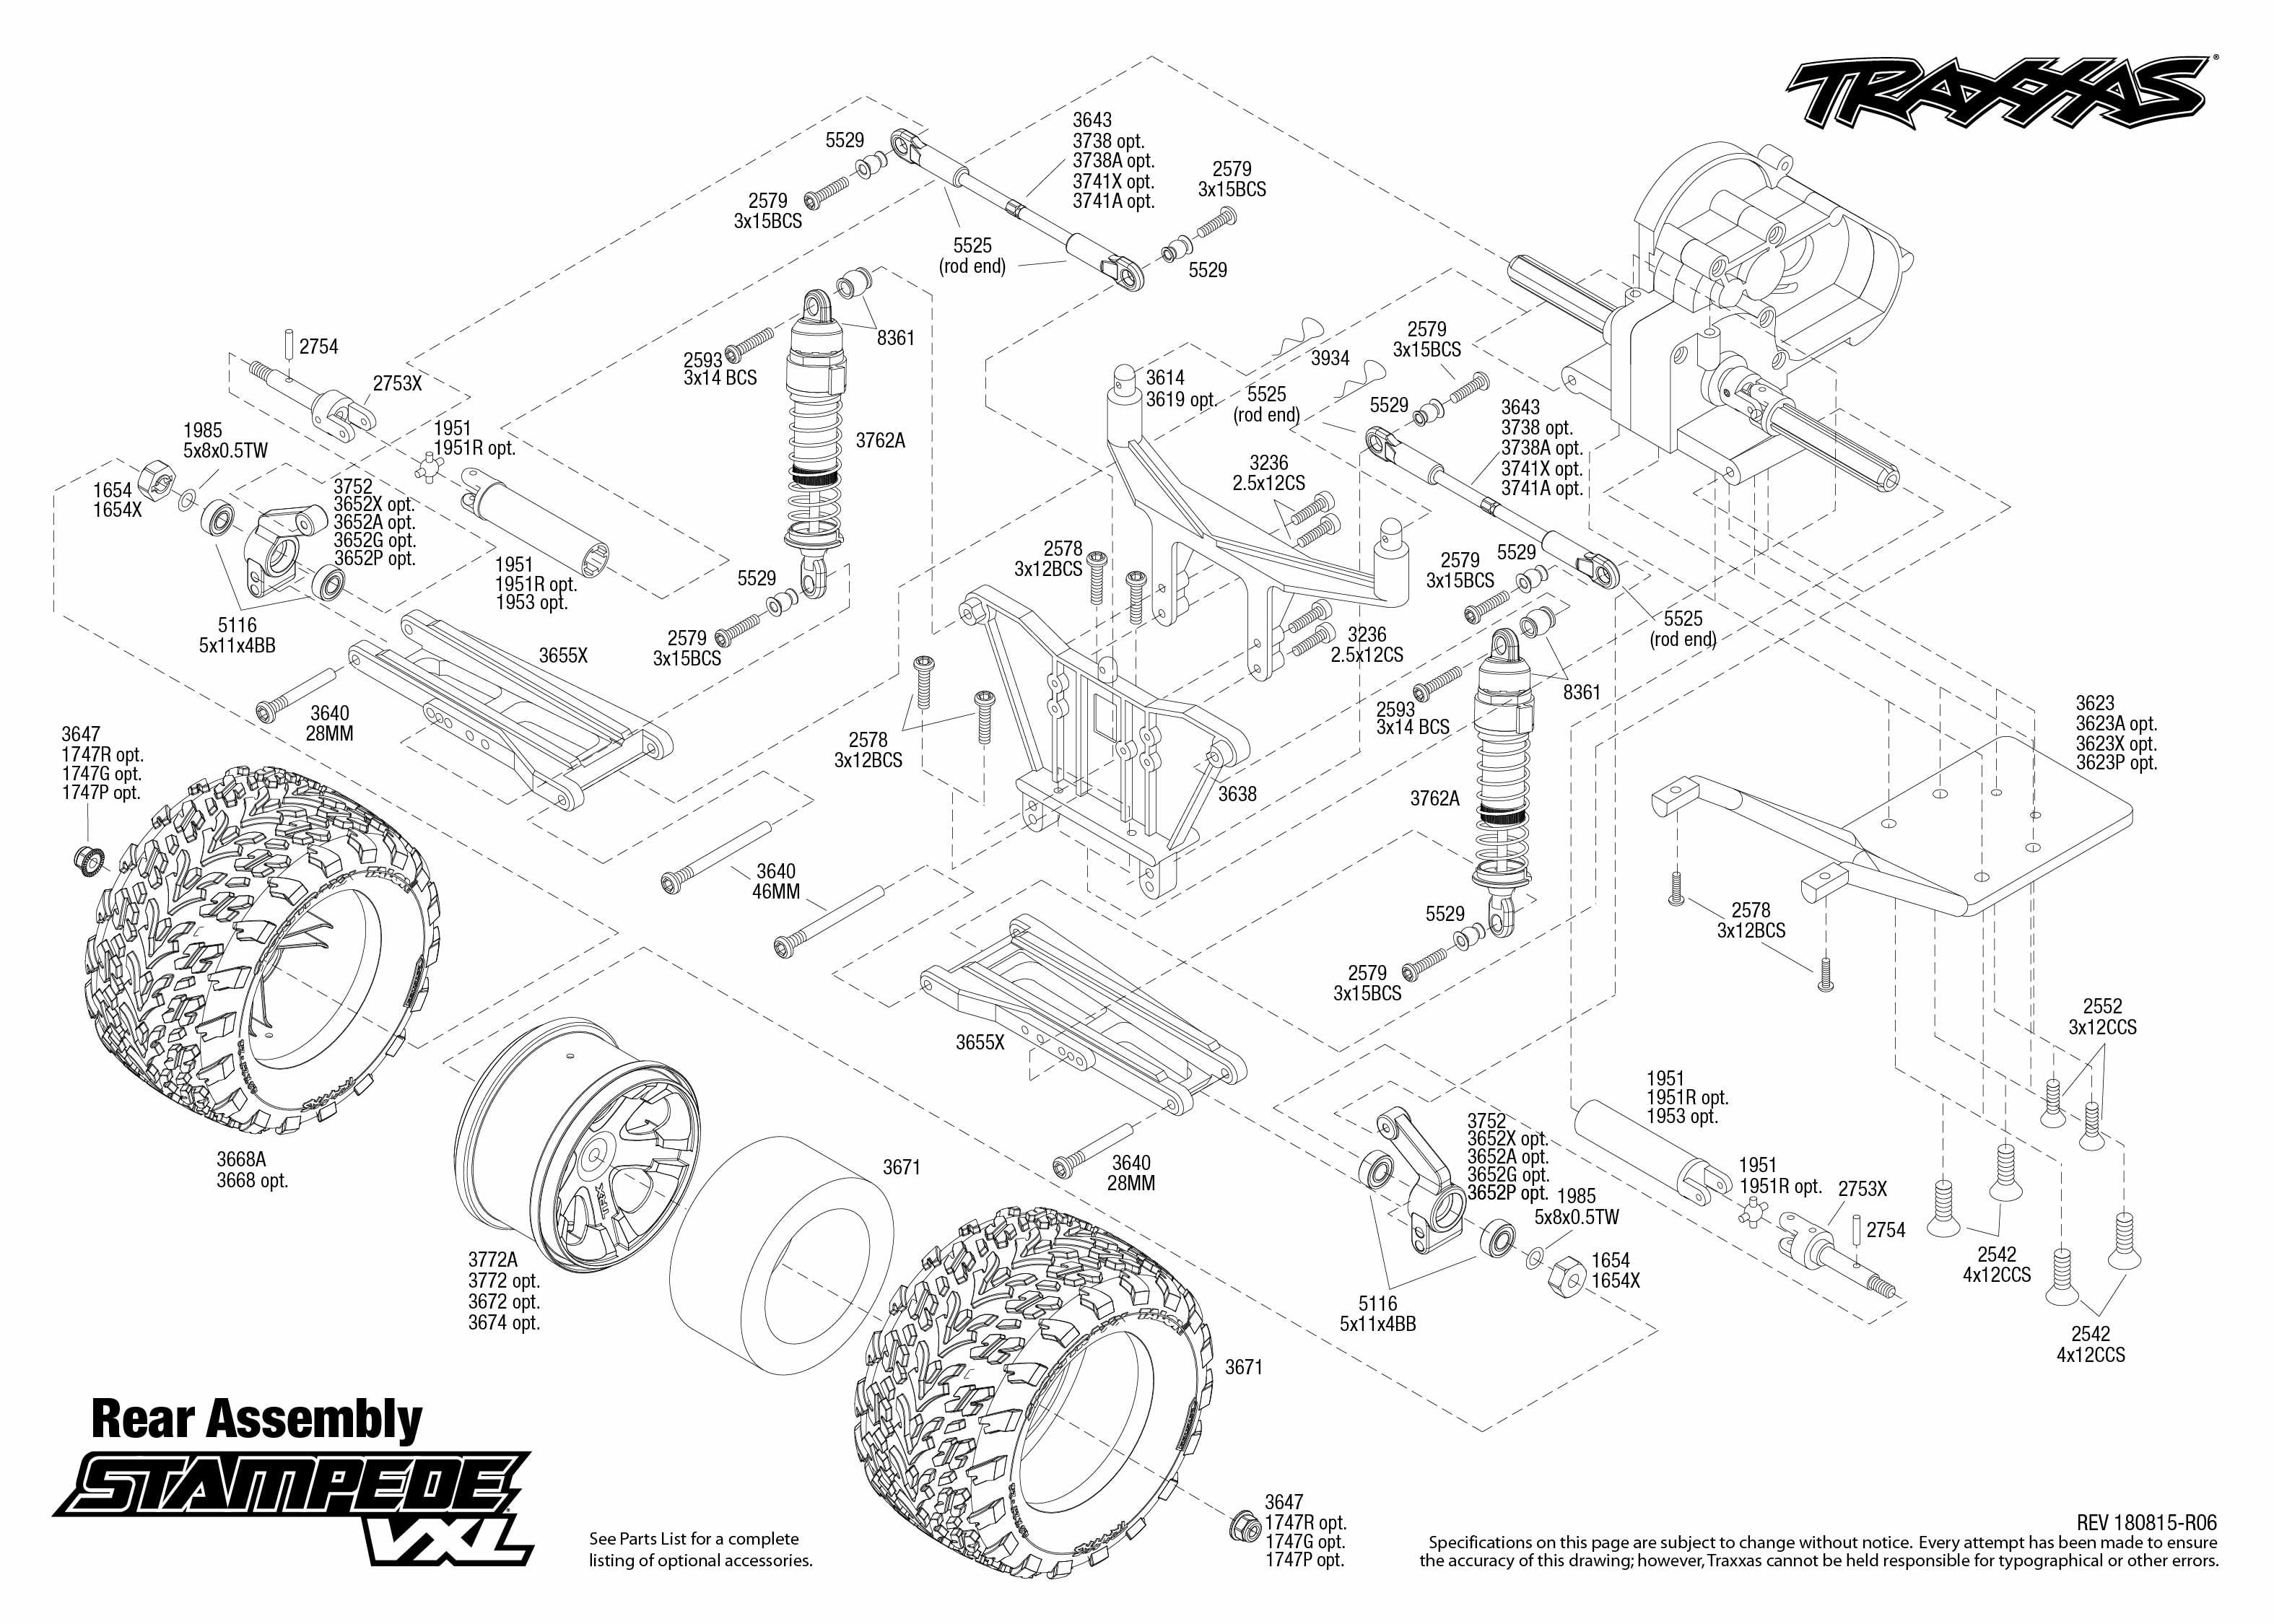 asco wiring diagram 617420 037 zc 2208  traxxas stampede wiring diagram get free image about  traxxas stampede wiring diagram